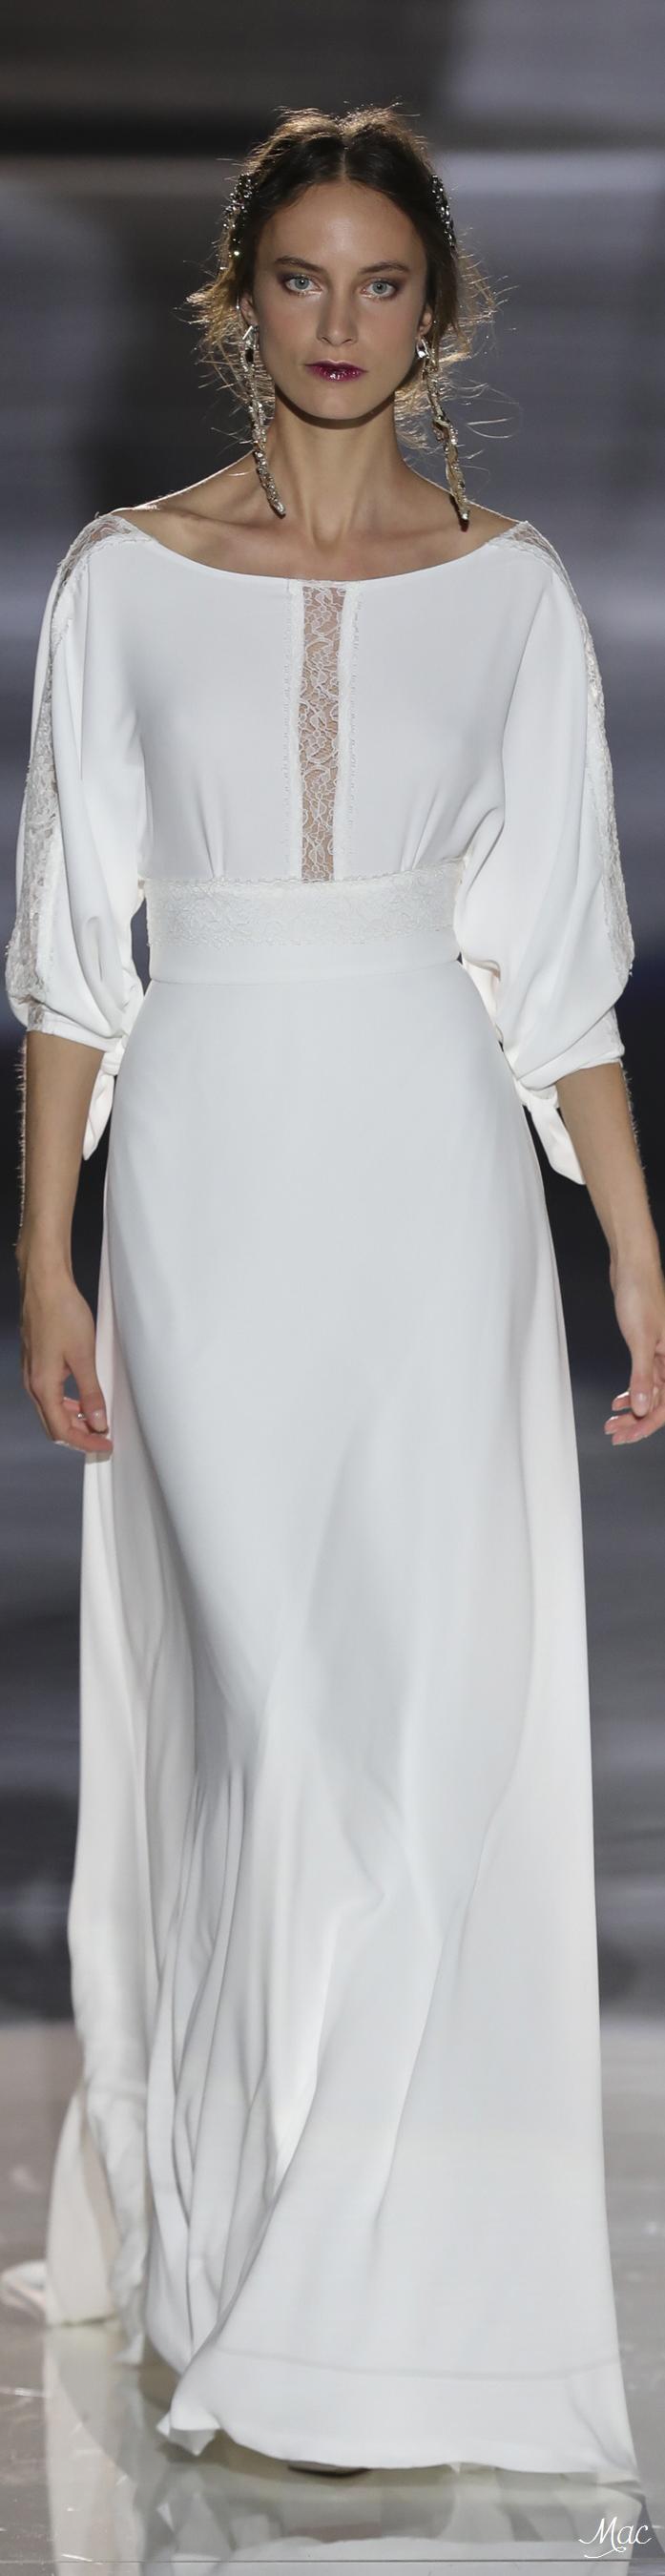 Spring bridal jesus piero alta costura pinterest spring